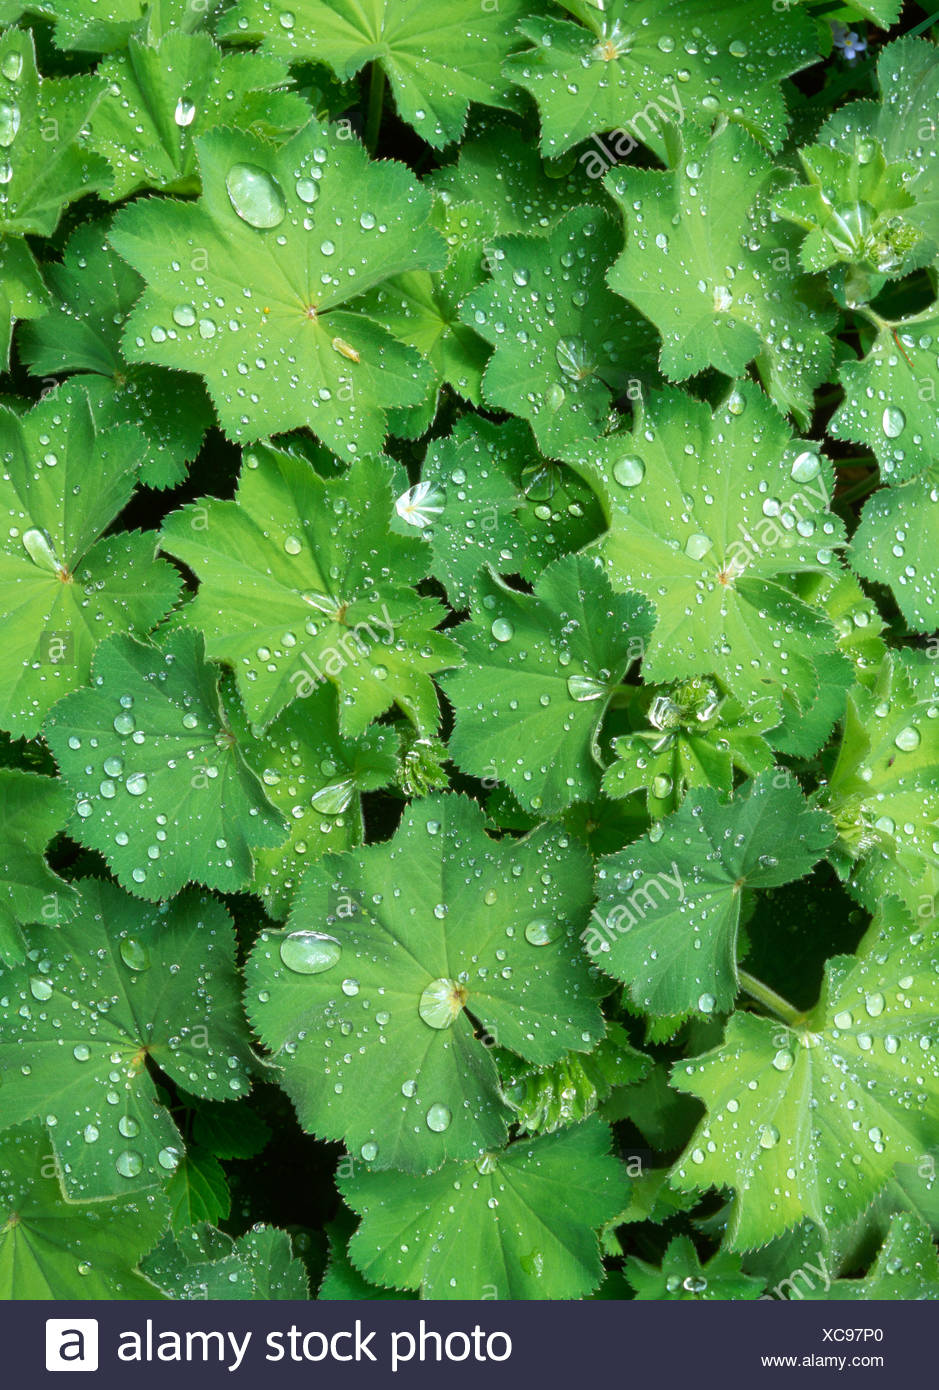 Dewdrops, water drops covered a leafy green garden plant, Schwaz, Tyrol, Austria, Europe - Stock Image